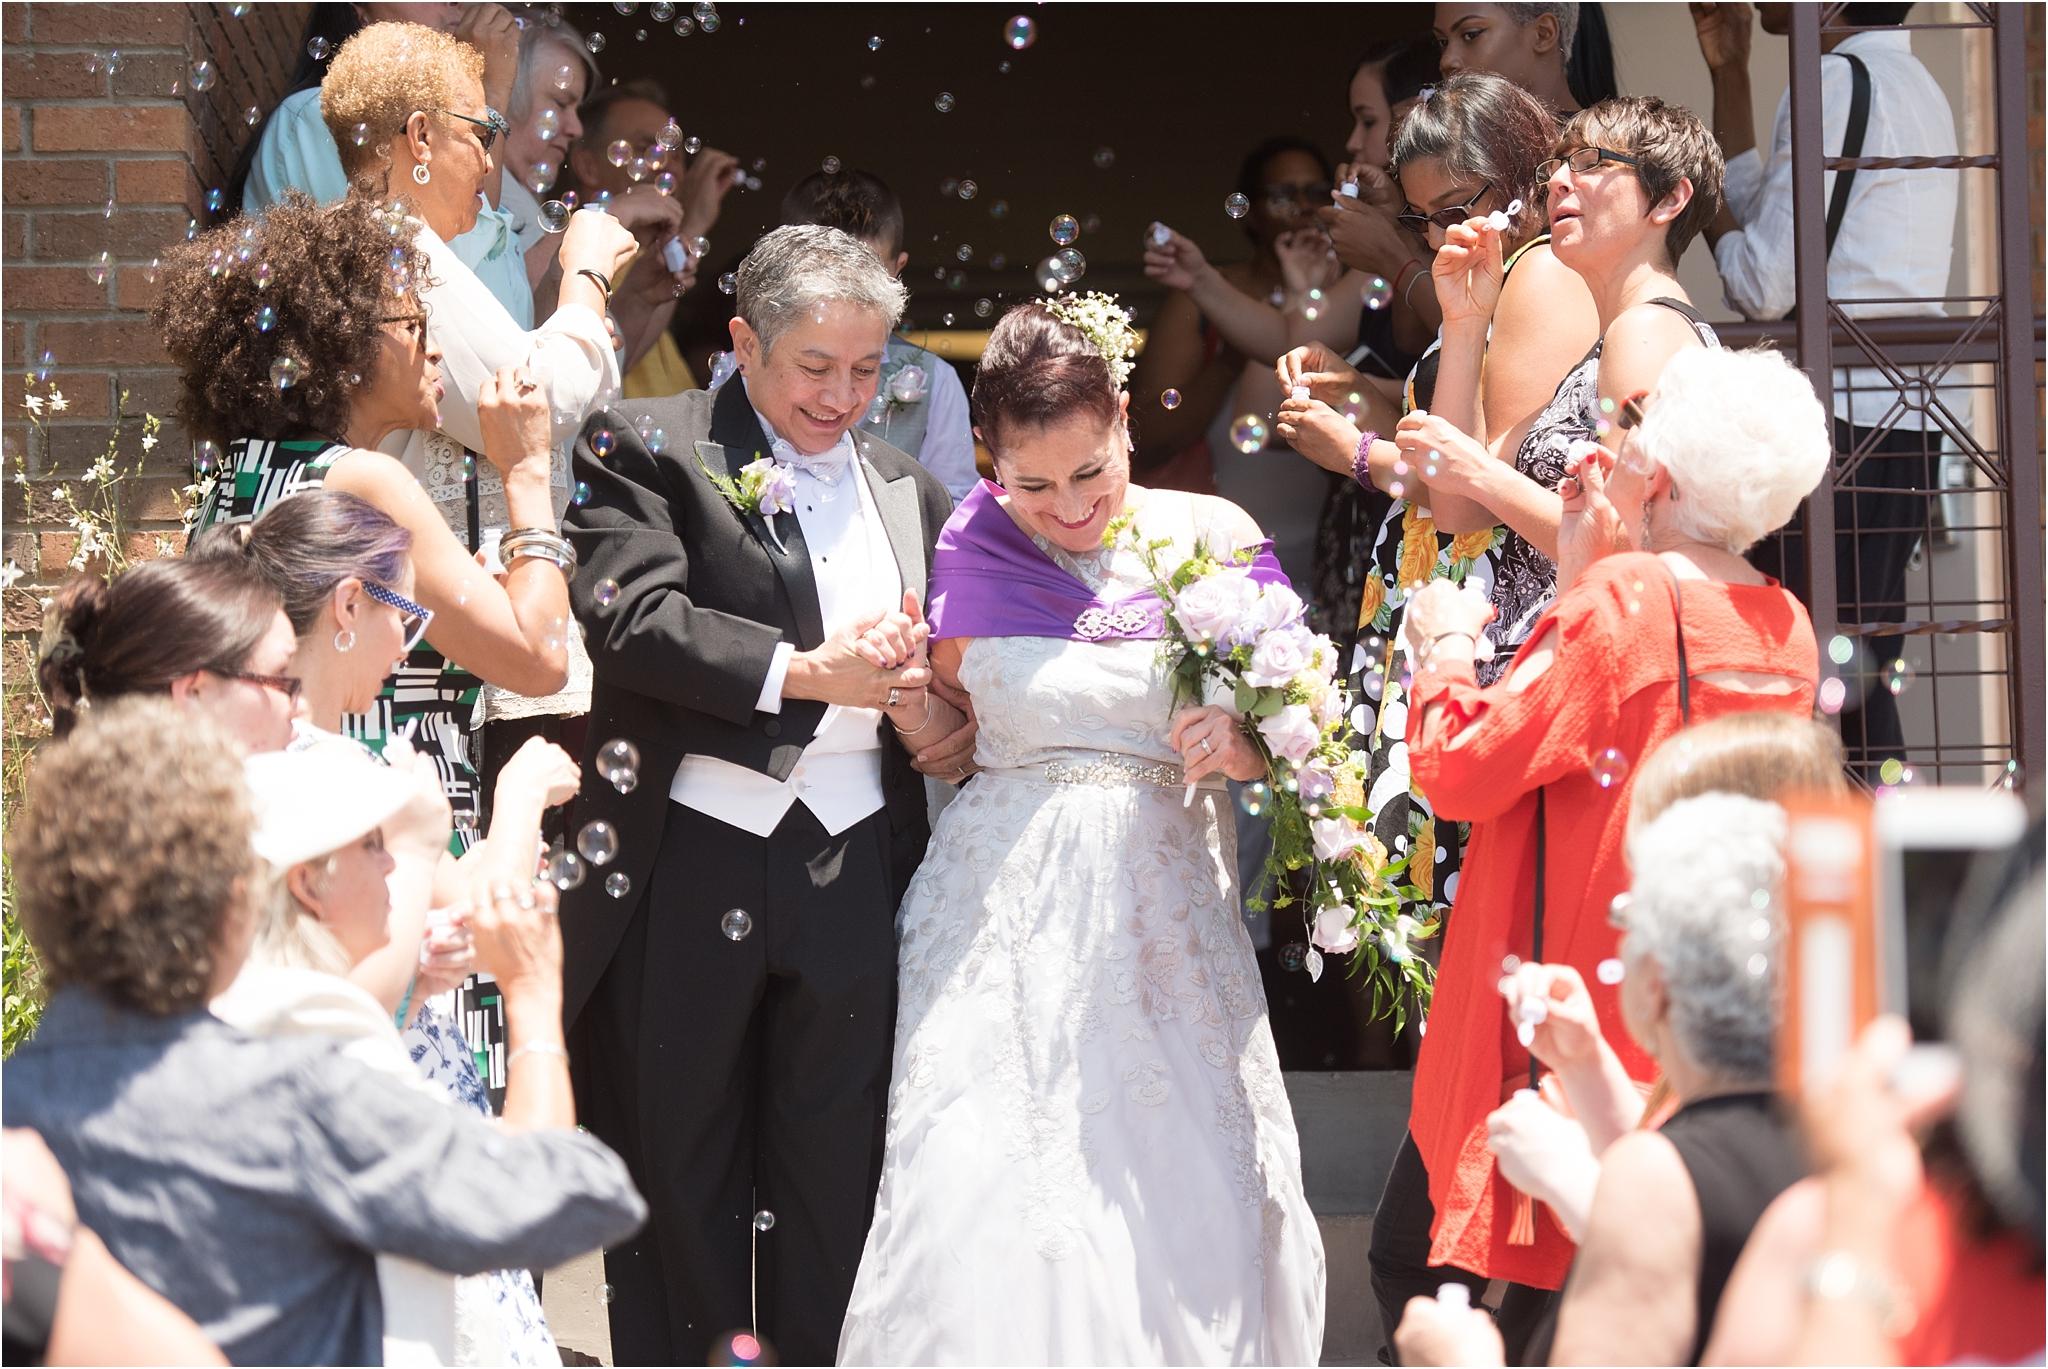 kayla kitts photography - albuquerque wedding photographer - hotel andaluz wedding_0014.jpg